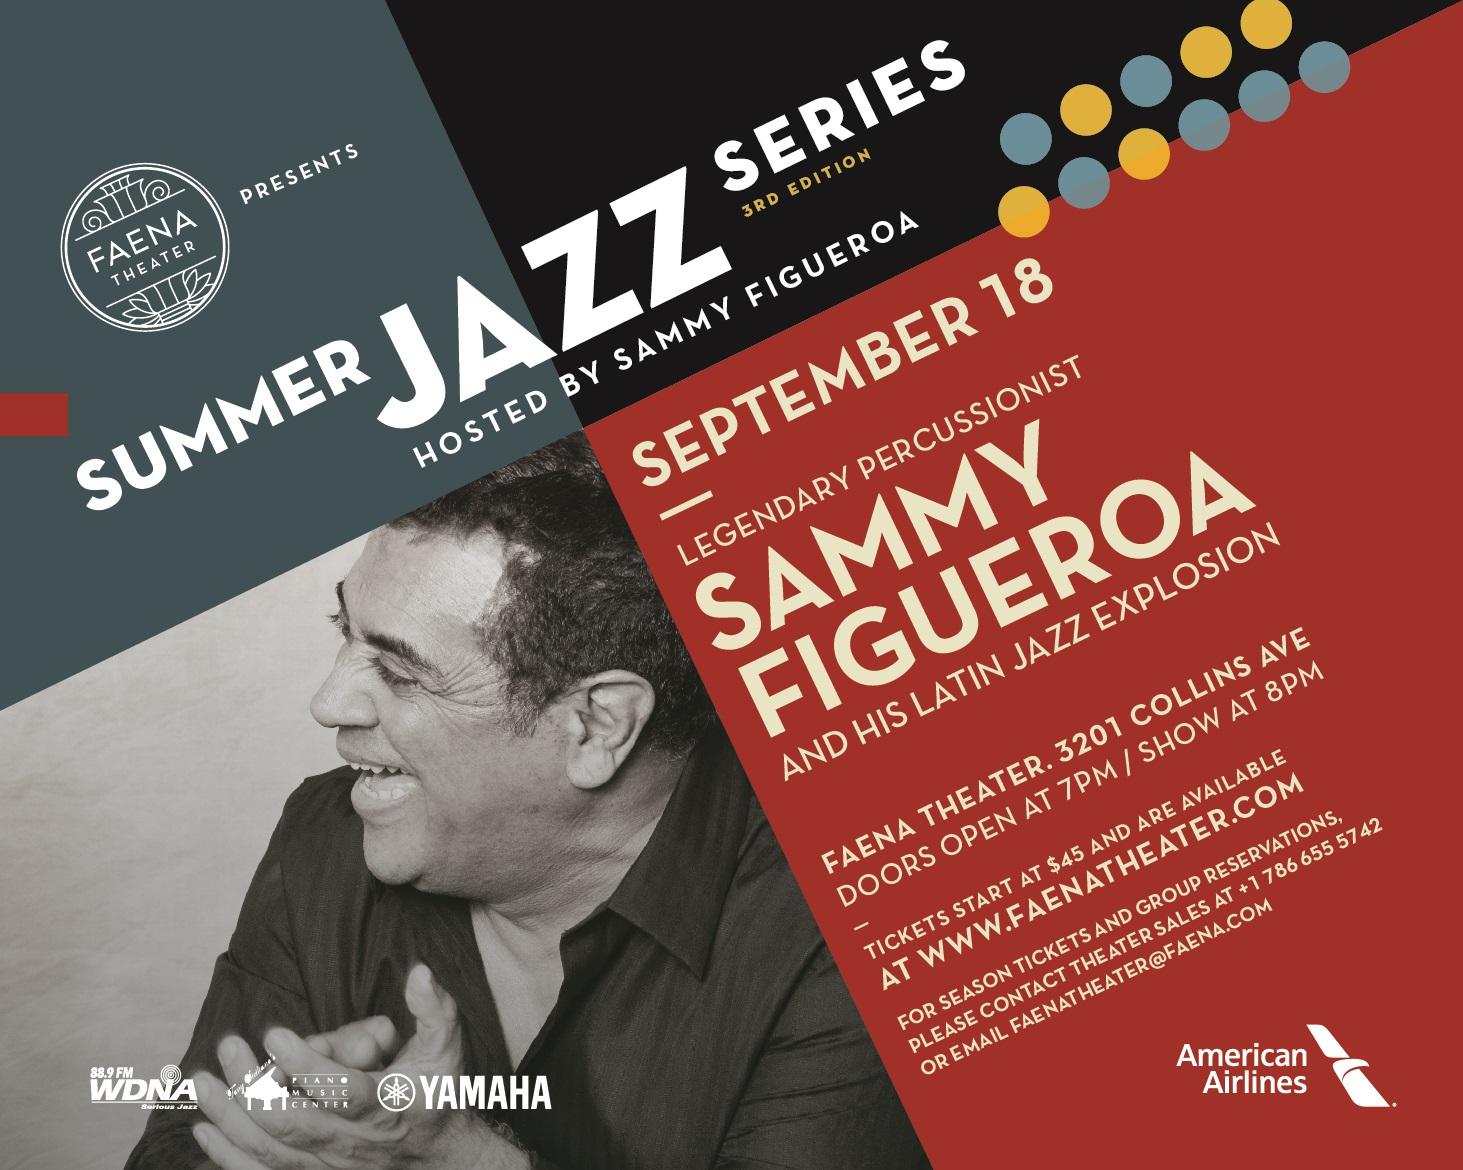 Sammy Figueroa and his Latin Jazz Explosion